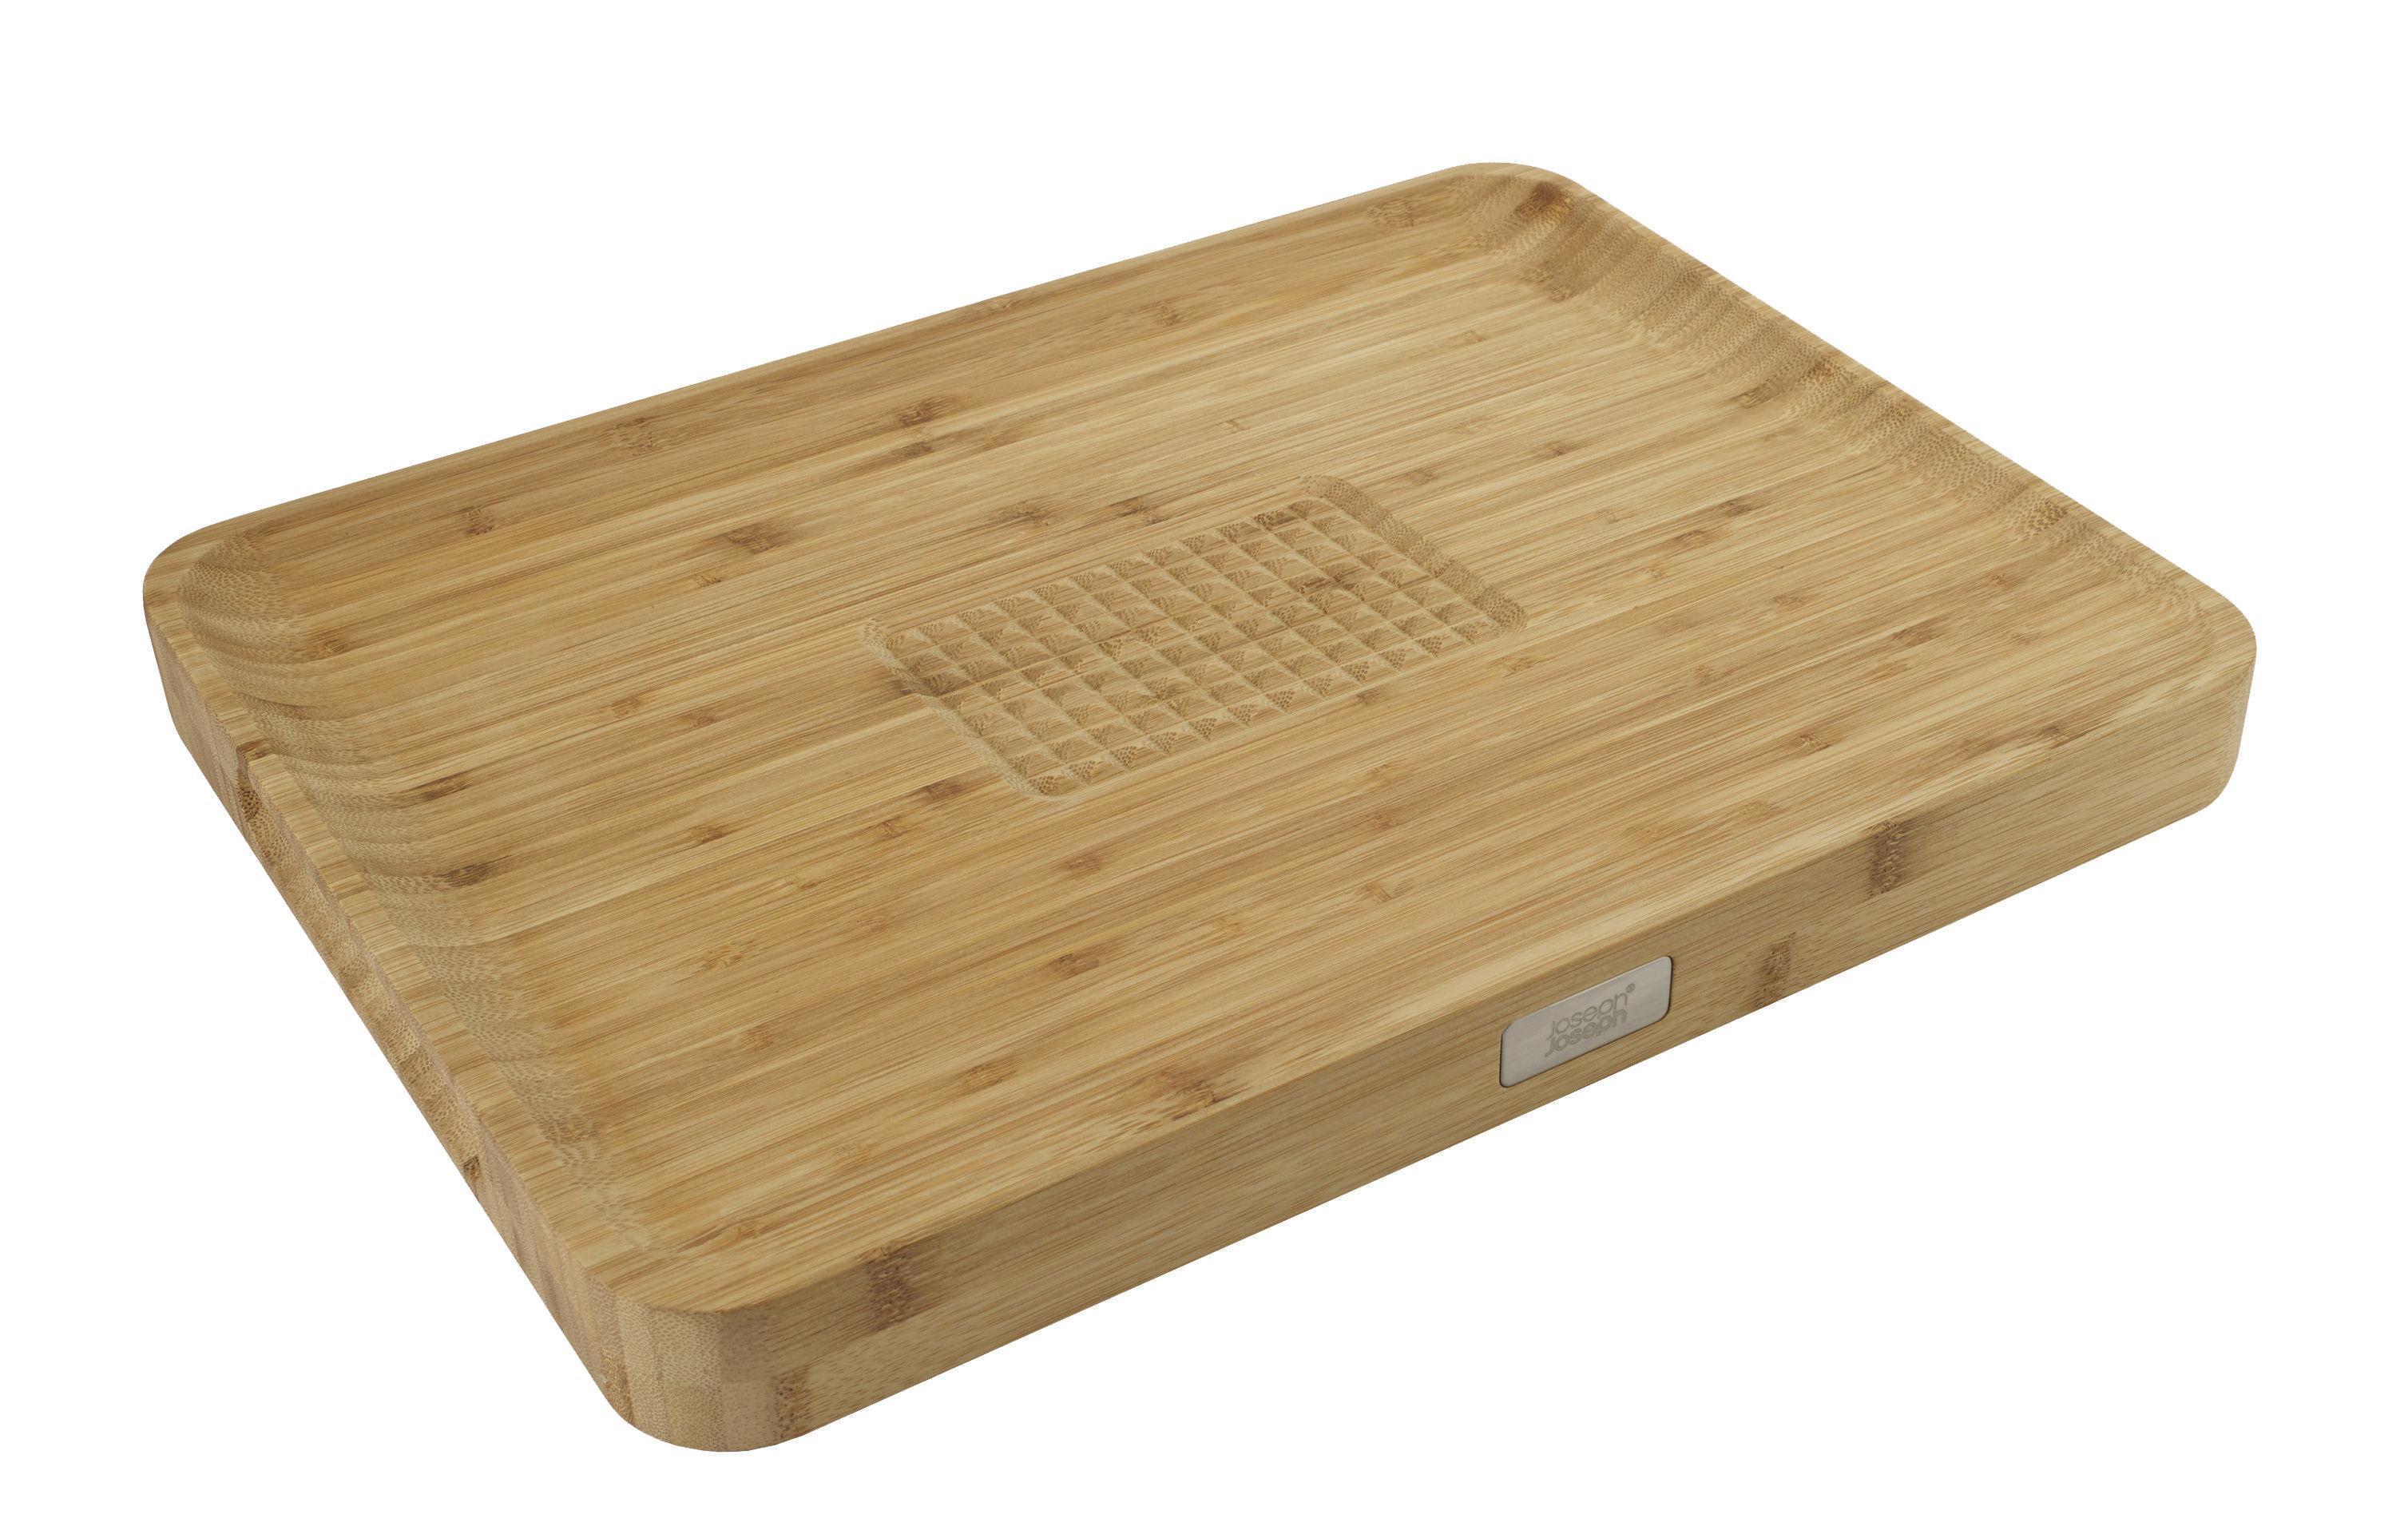 Küche - Küchenutensilien - Cut & Carve Schneidebrett Bambus / schräge Oberfläche - Joseph Joseph - Bambus, natur - Bambus